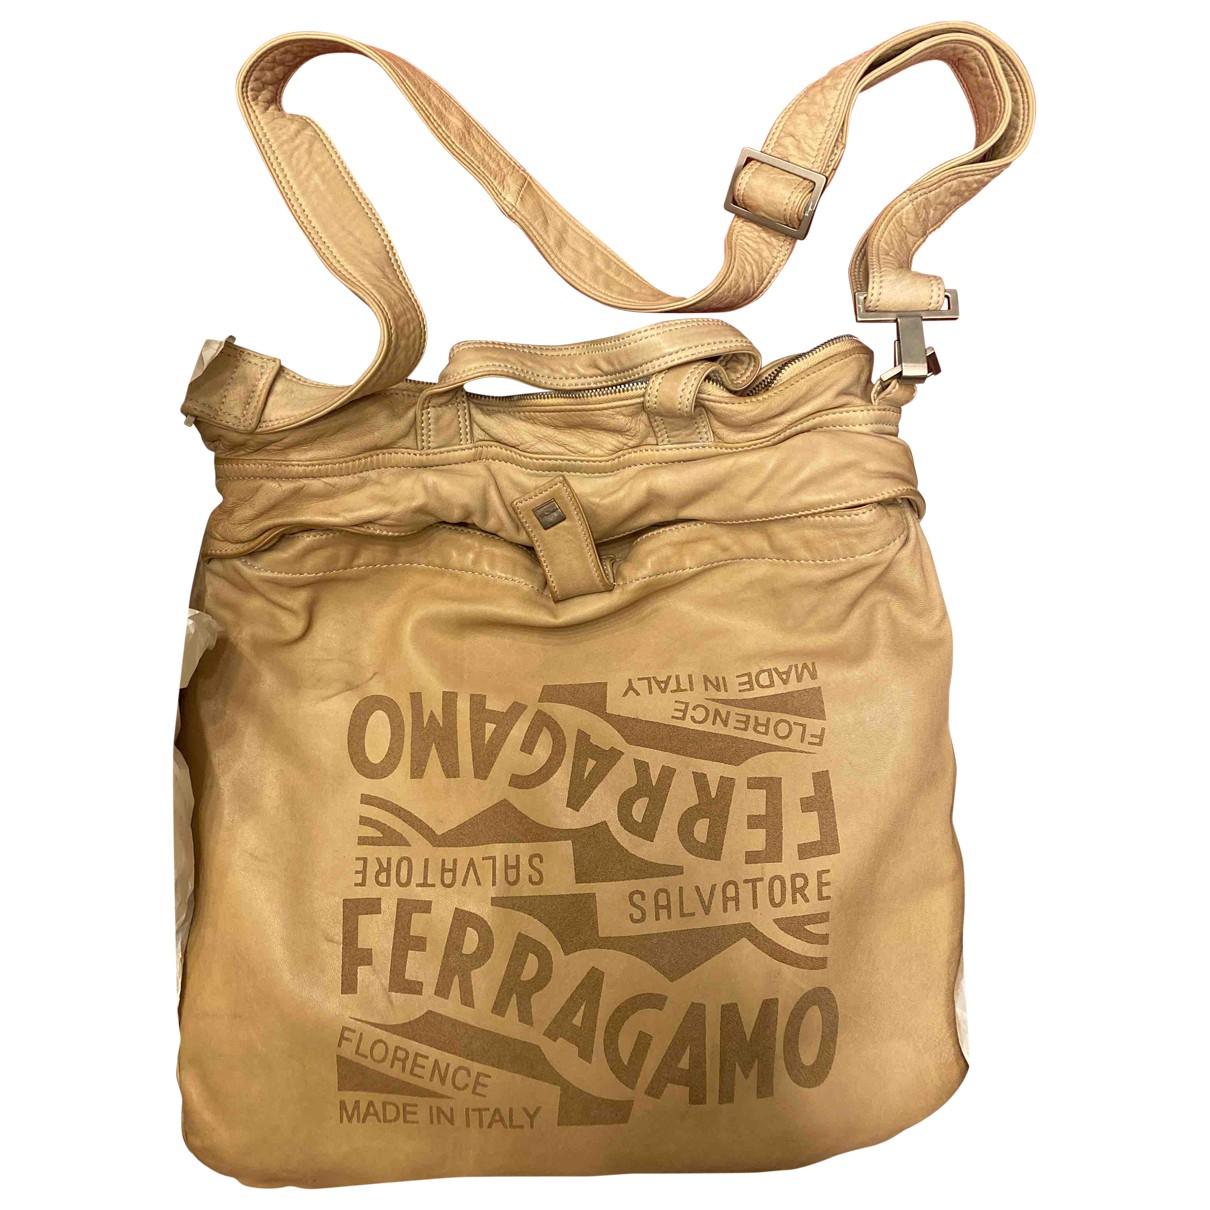 Salvatore Ferragamo - Sac a main   pour femme en cuir - kaki